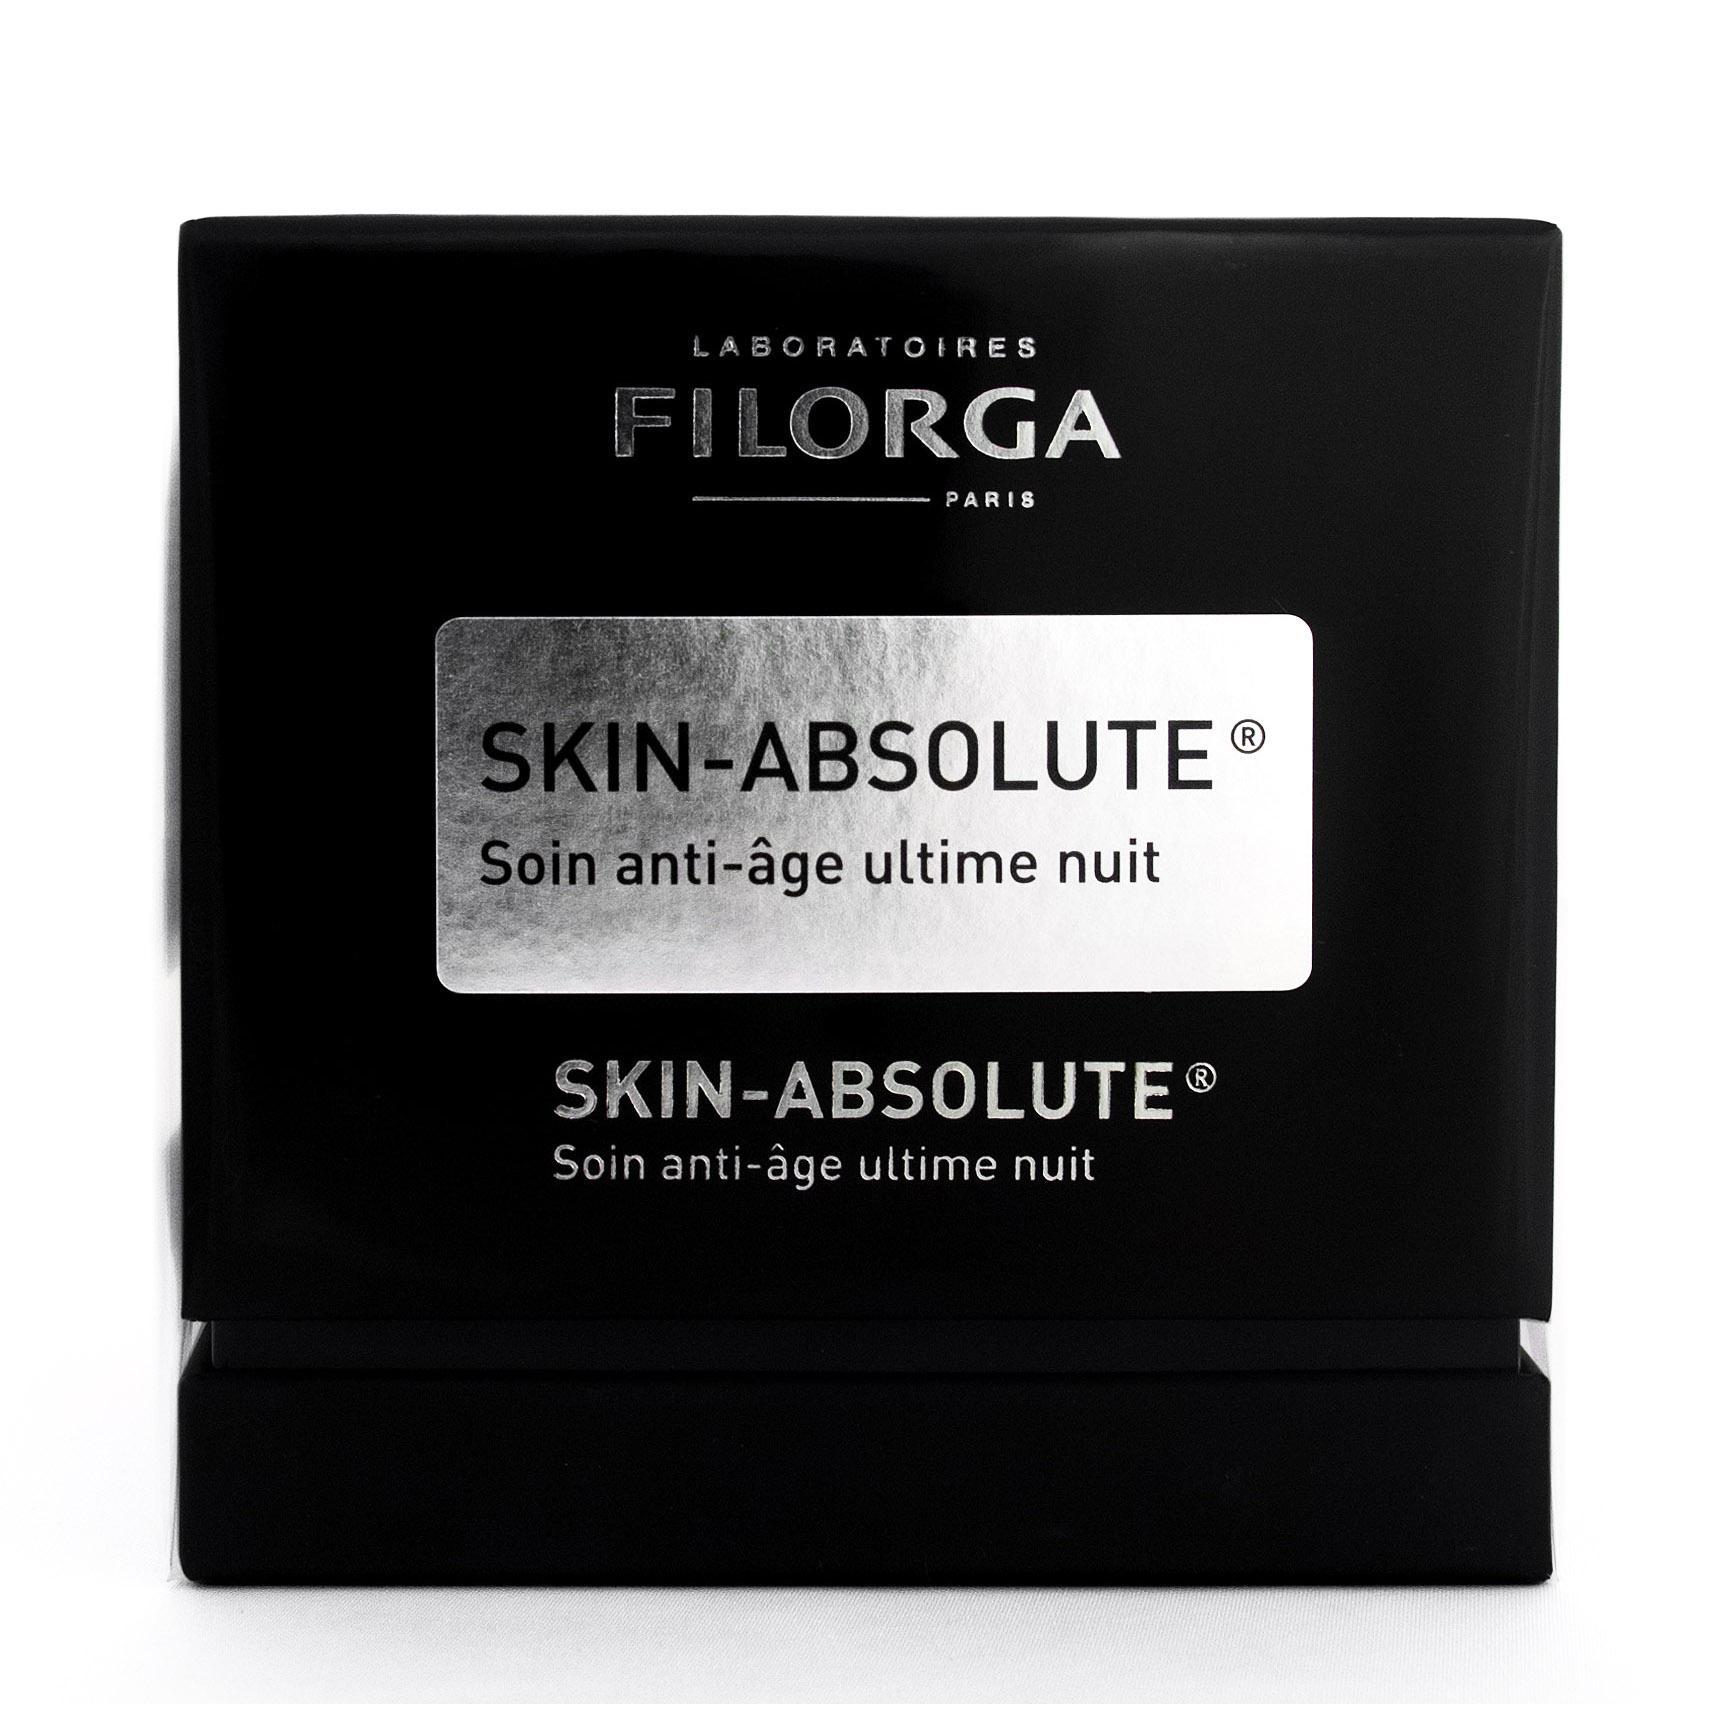 Filorga  Skin-Absolute Ночной крем Скин-Абсолют 50 мл